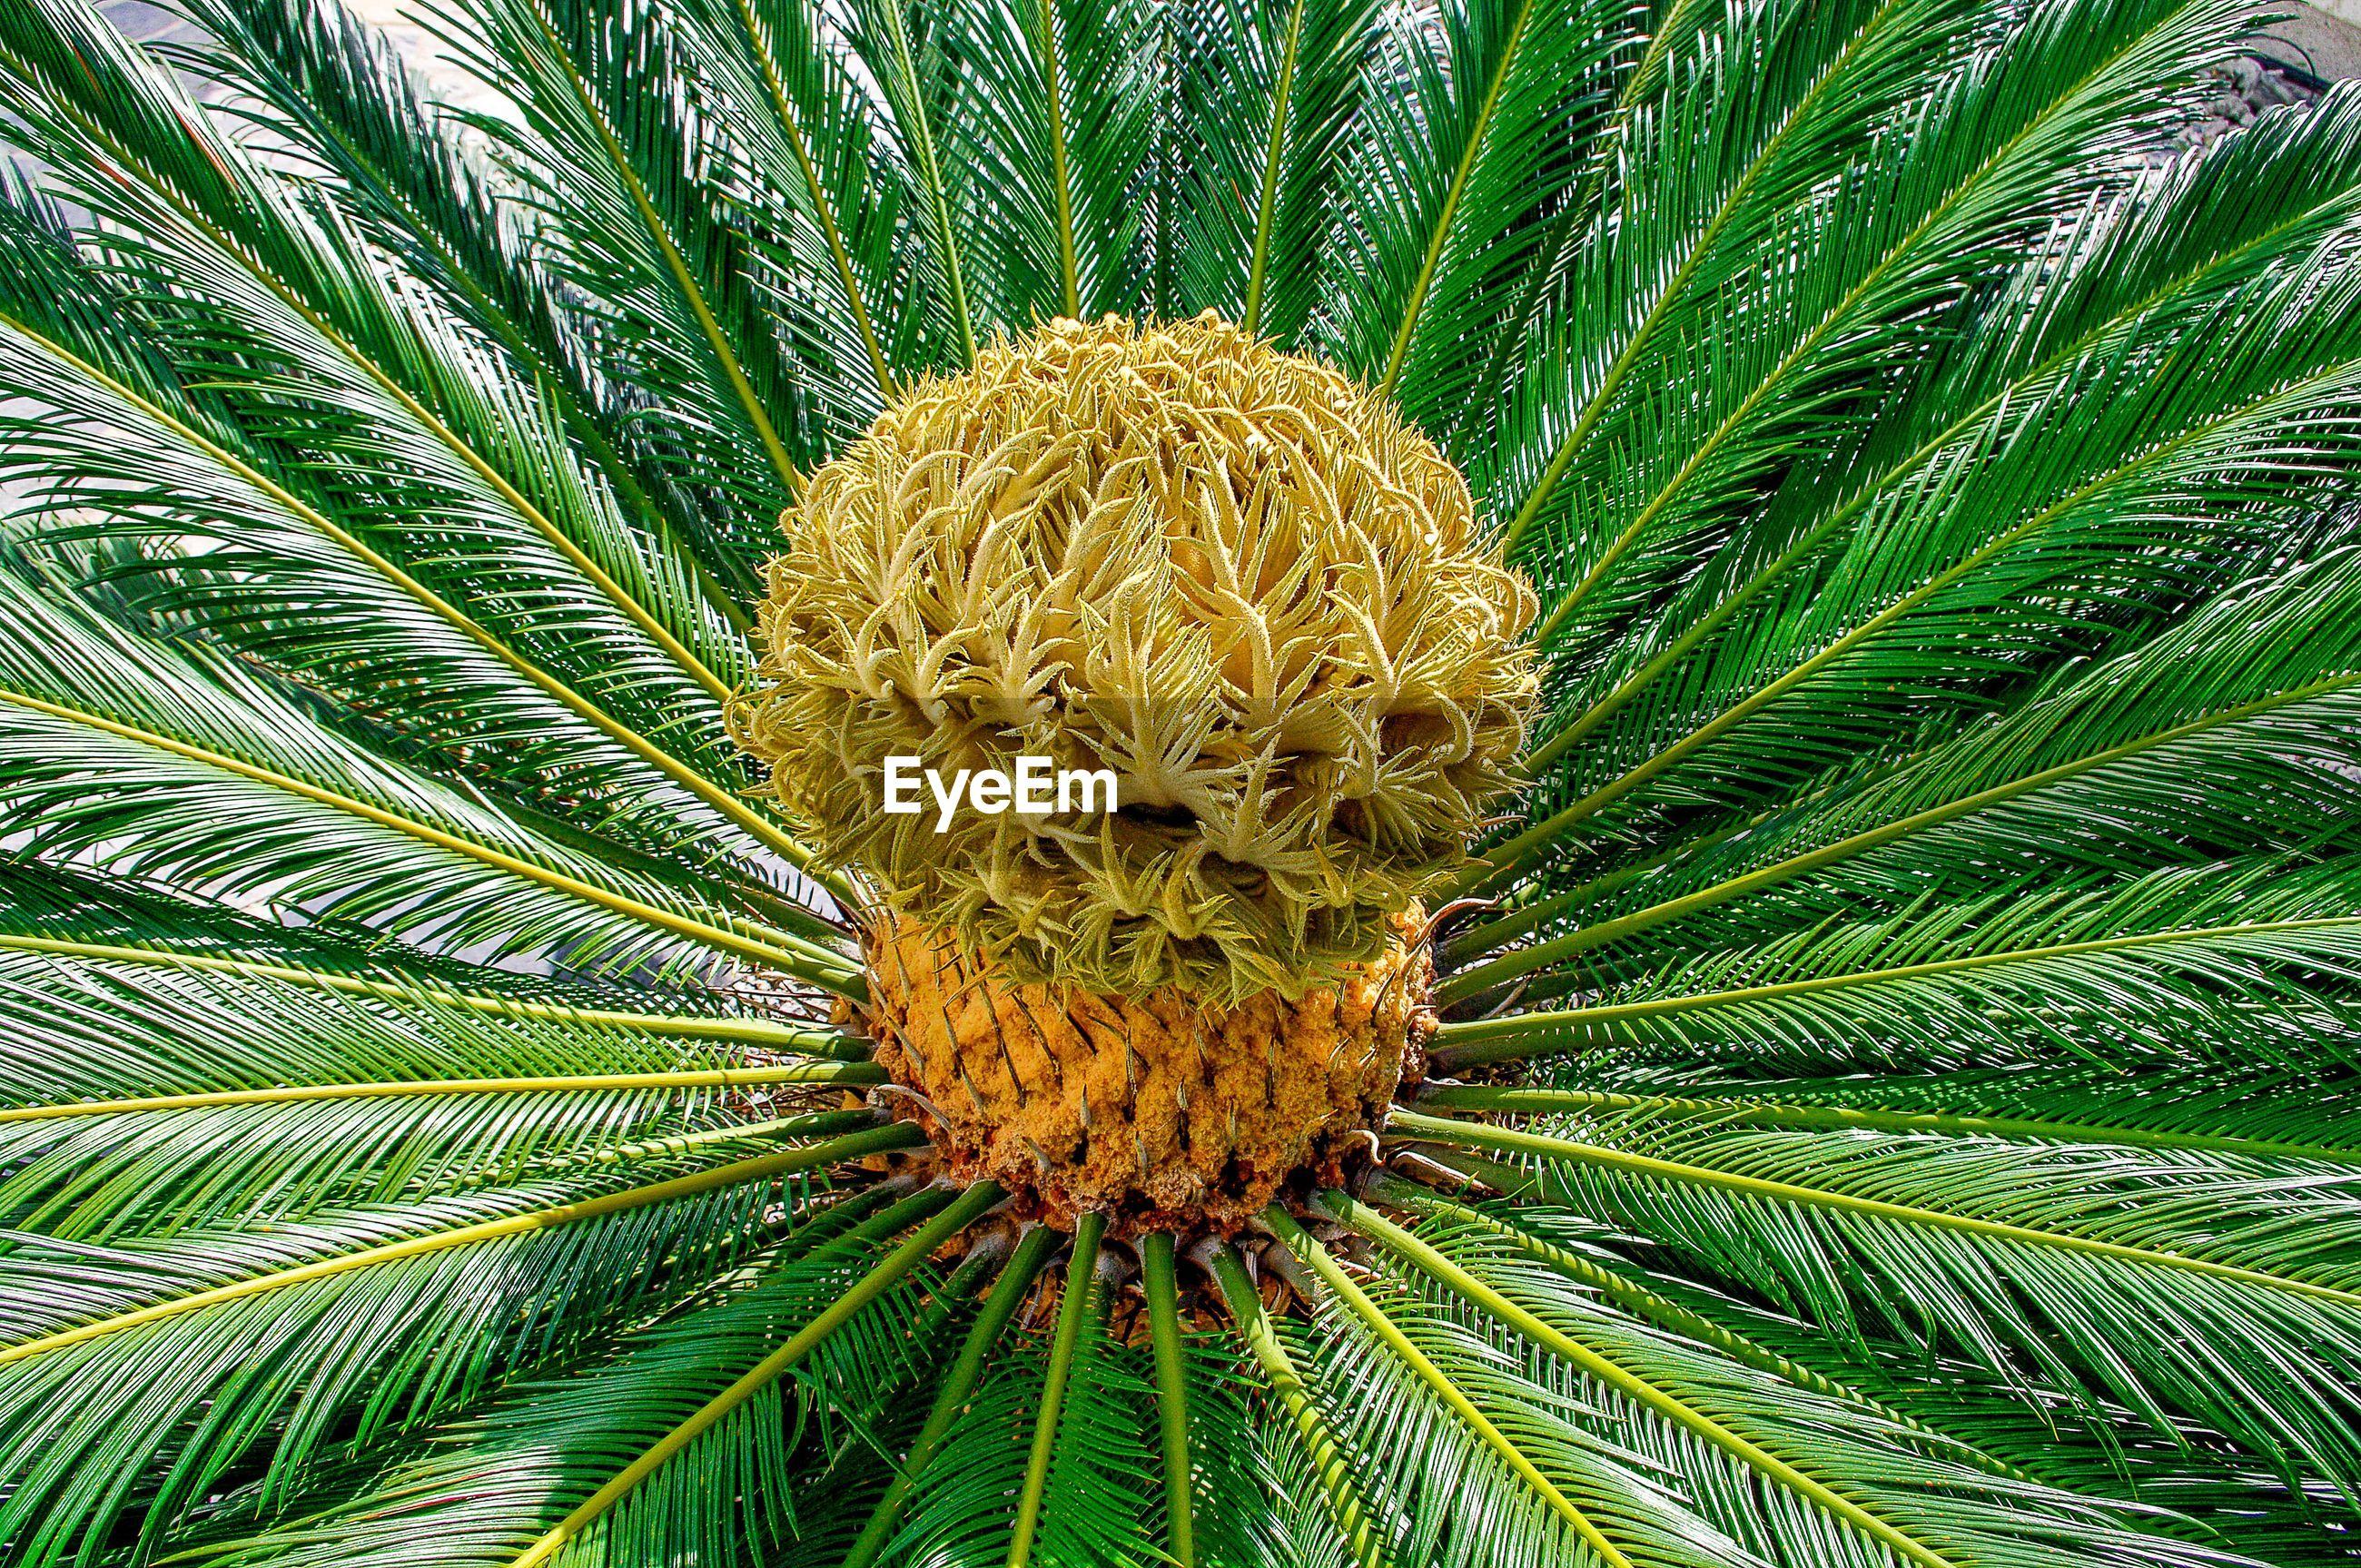 PALM LEAVES ON PALM TREE